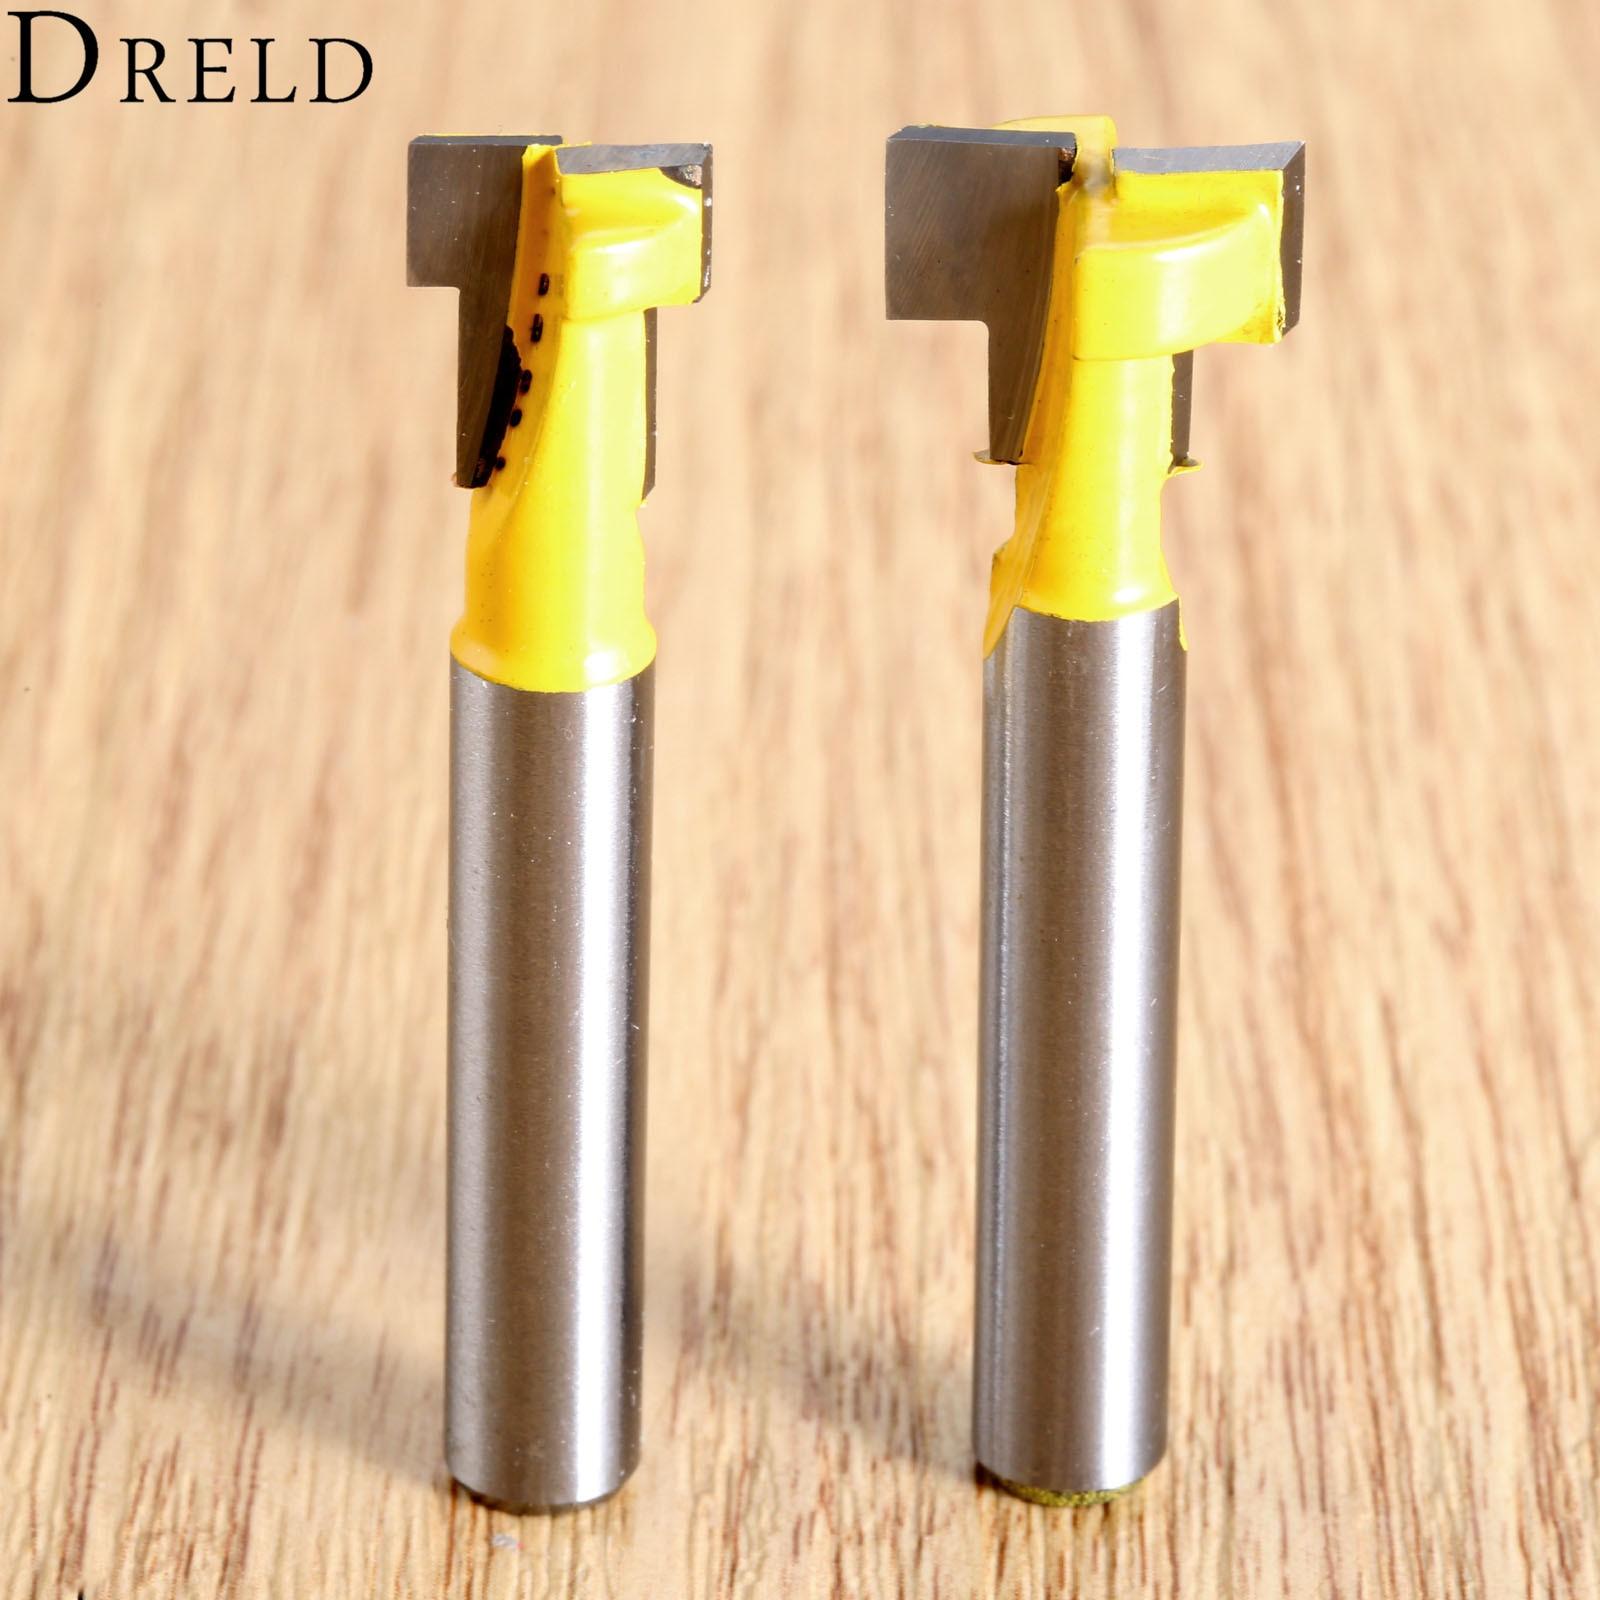 1//2-inch Shank 3//8-inch Cutting Diameter 2 Flutes Round Nose Router Bit 2pcs